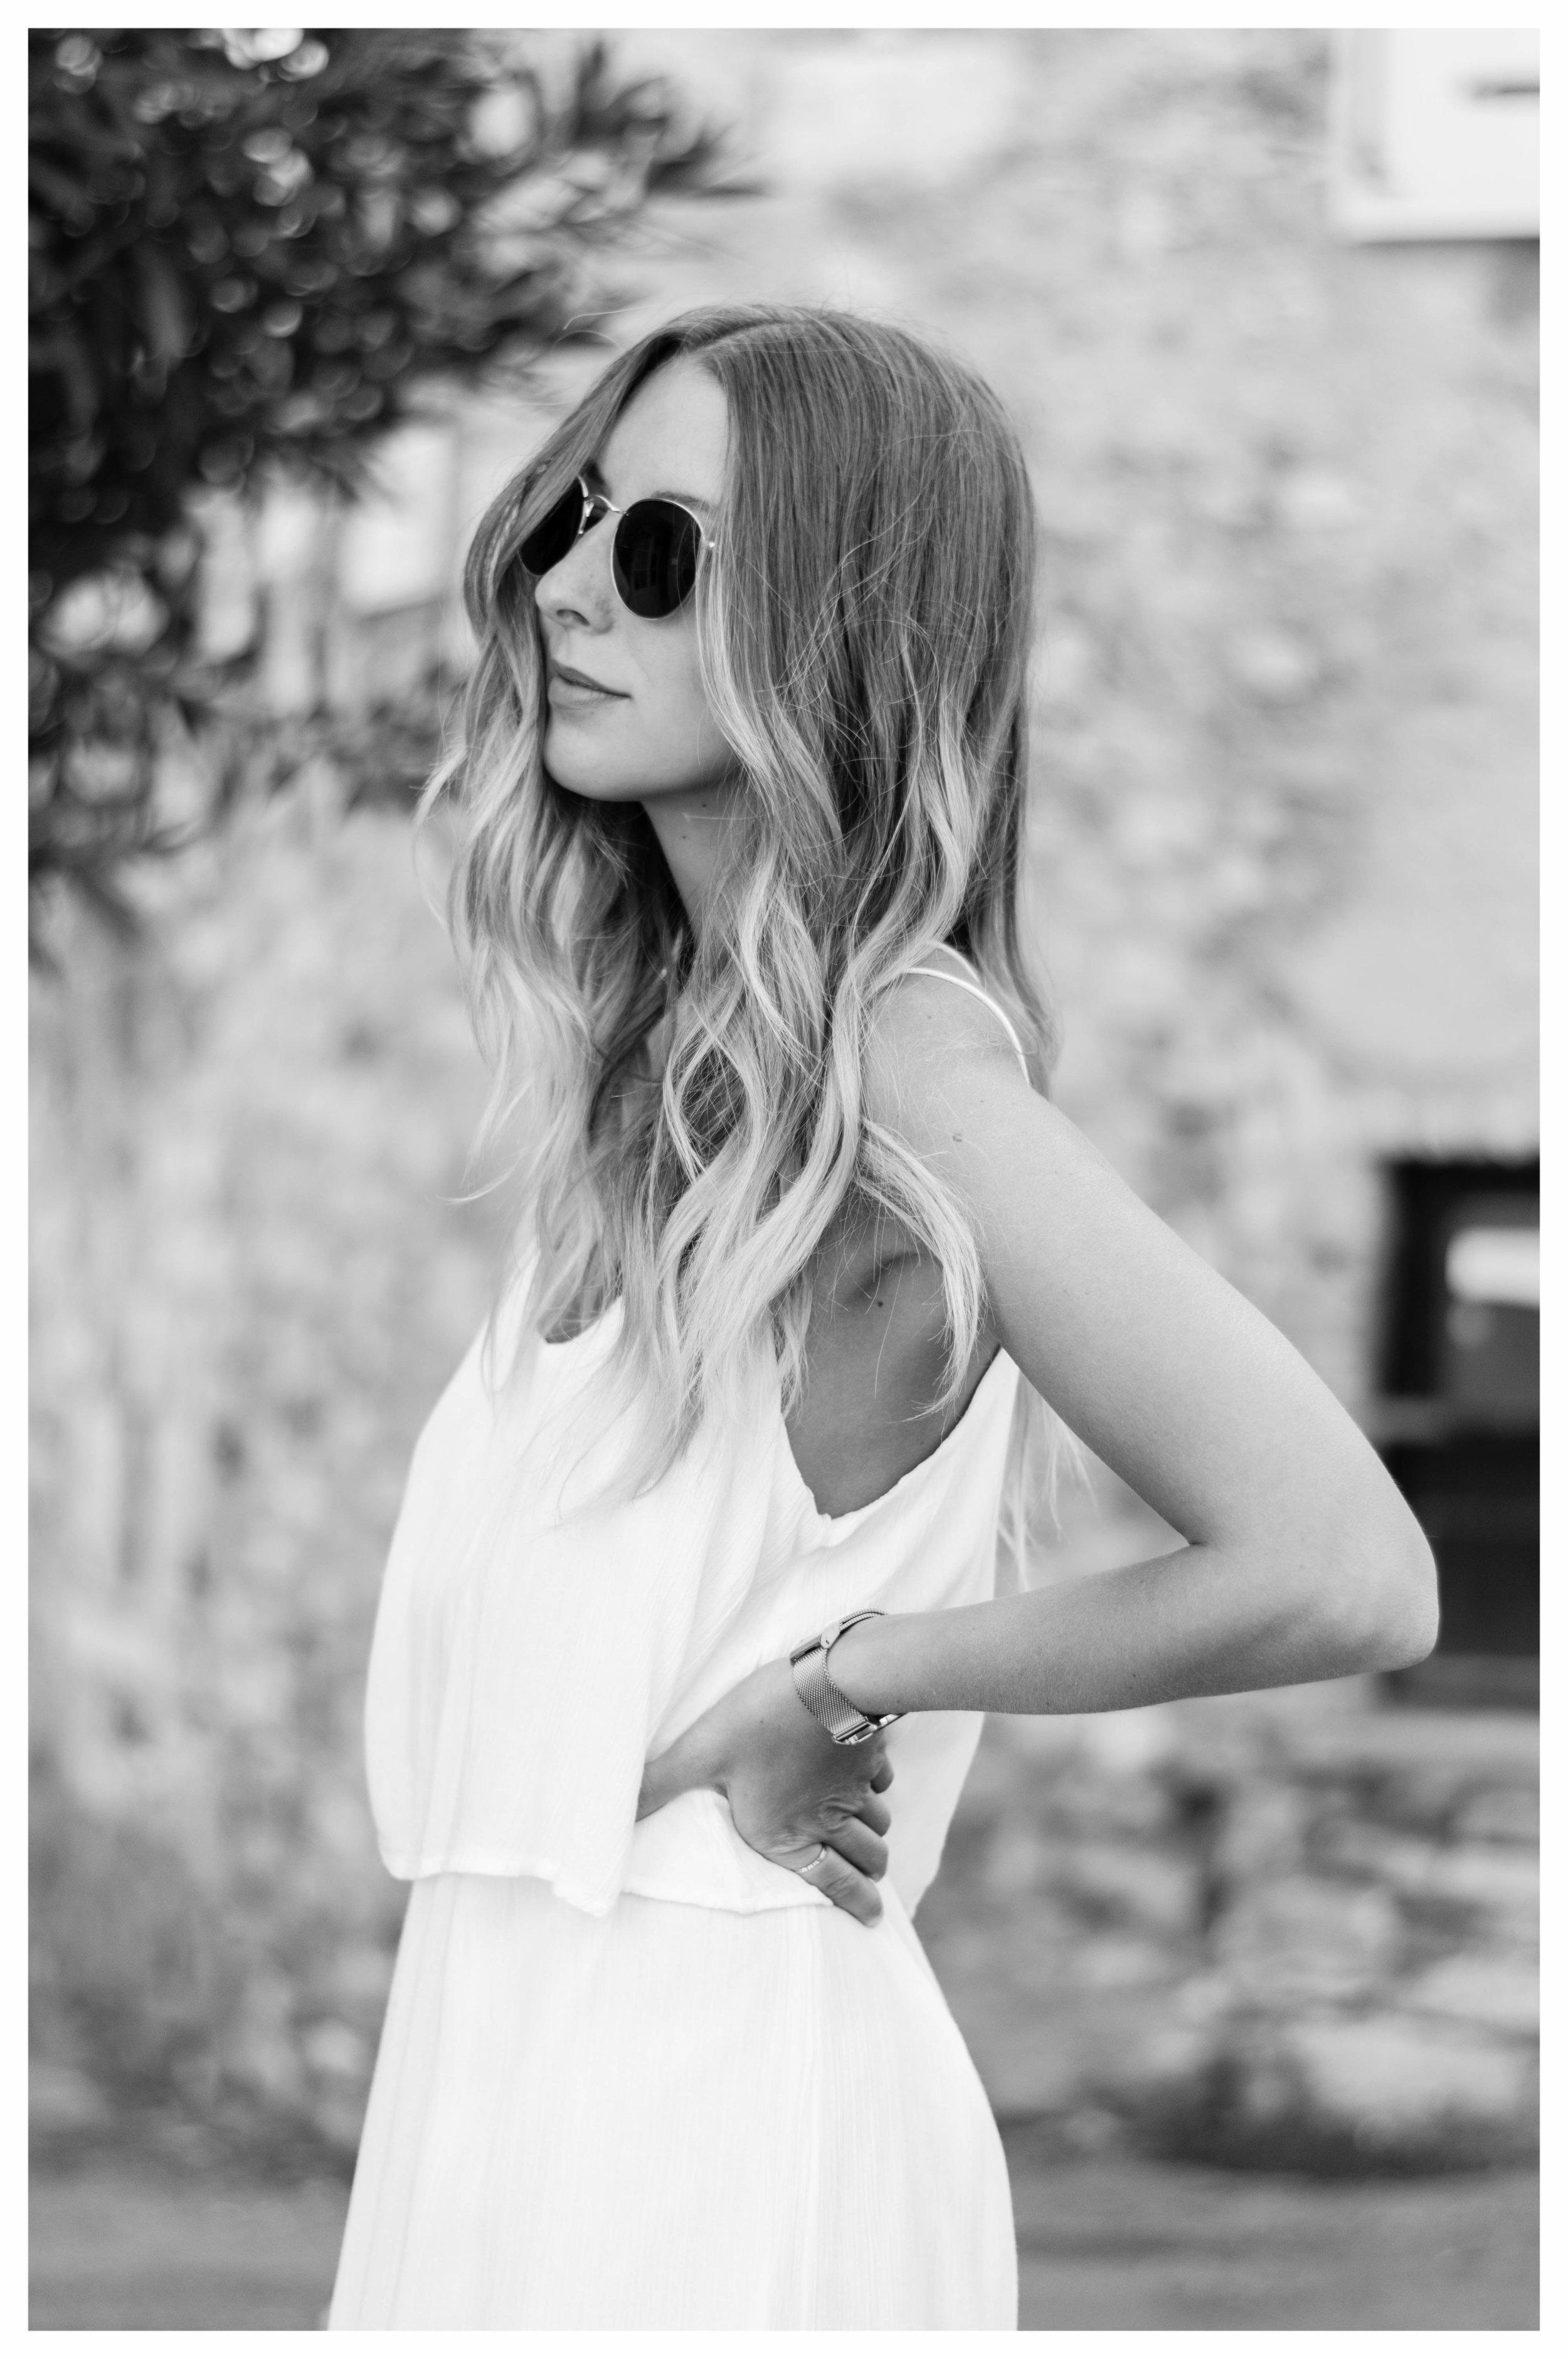 White Dress - OSIARAH.COM (16 sur 16).jpg